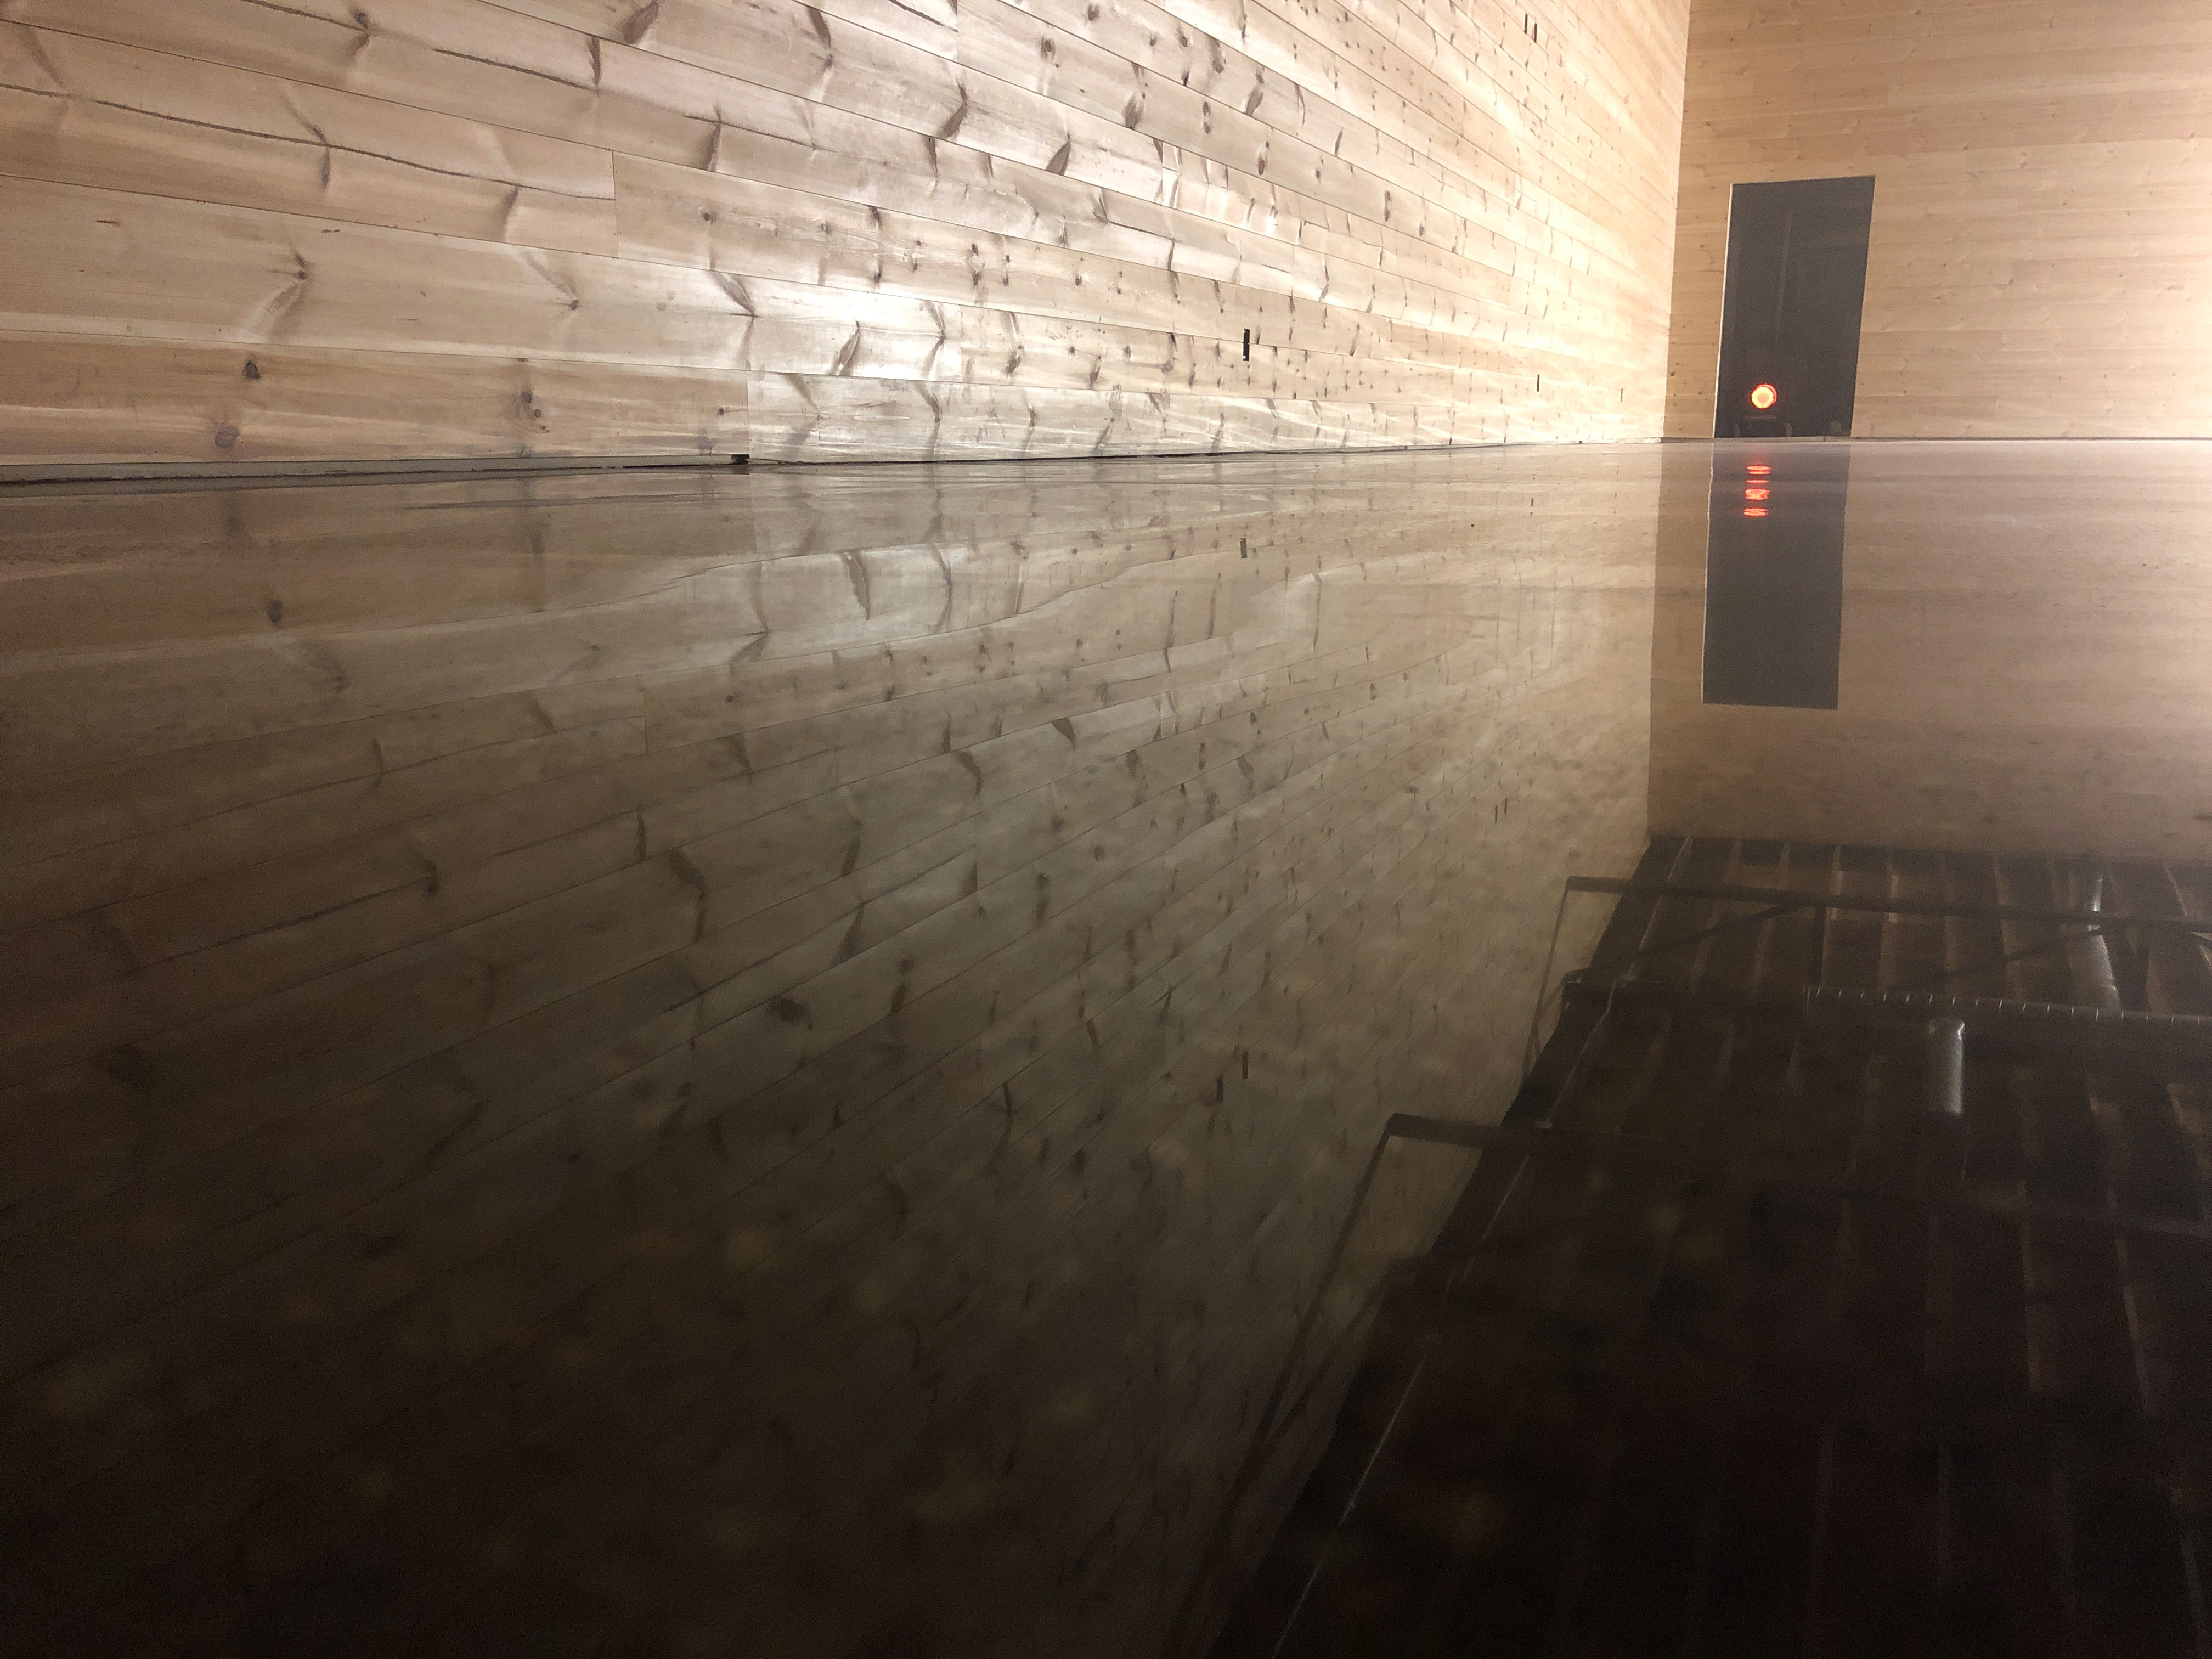 Polished Concrete Restaurant Floor